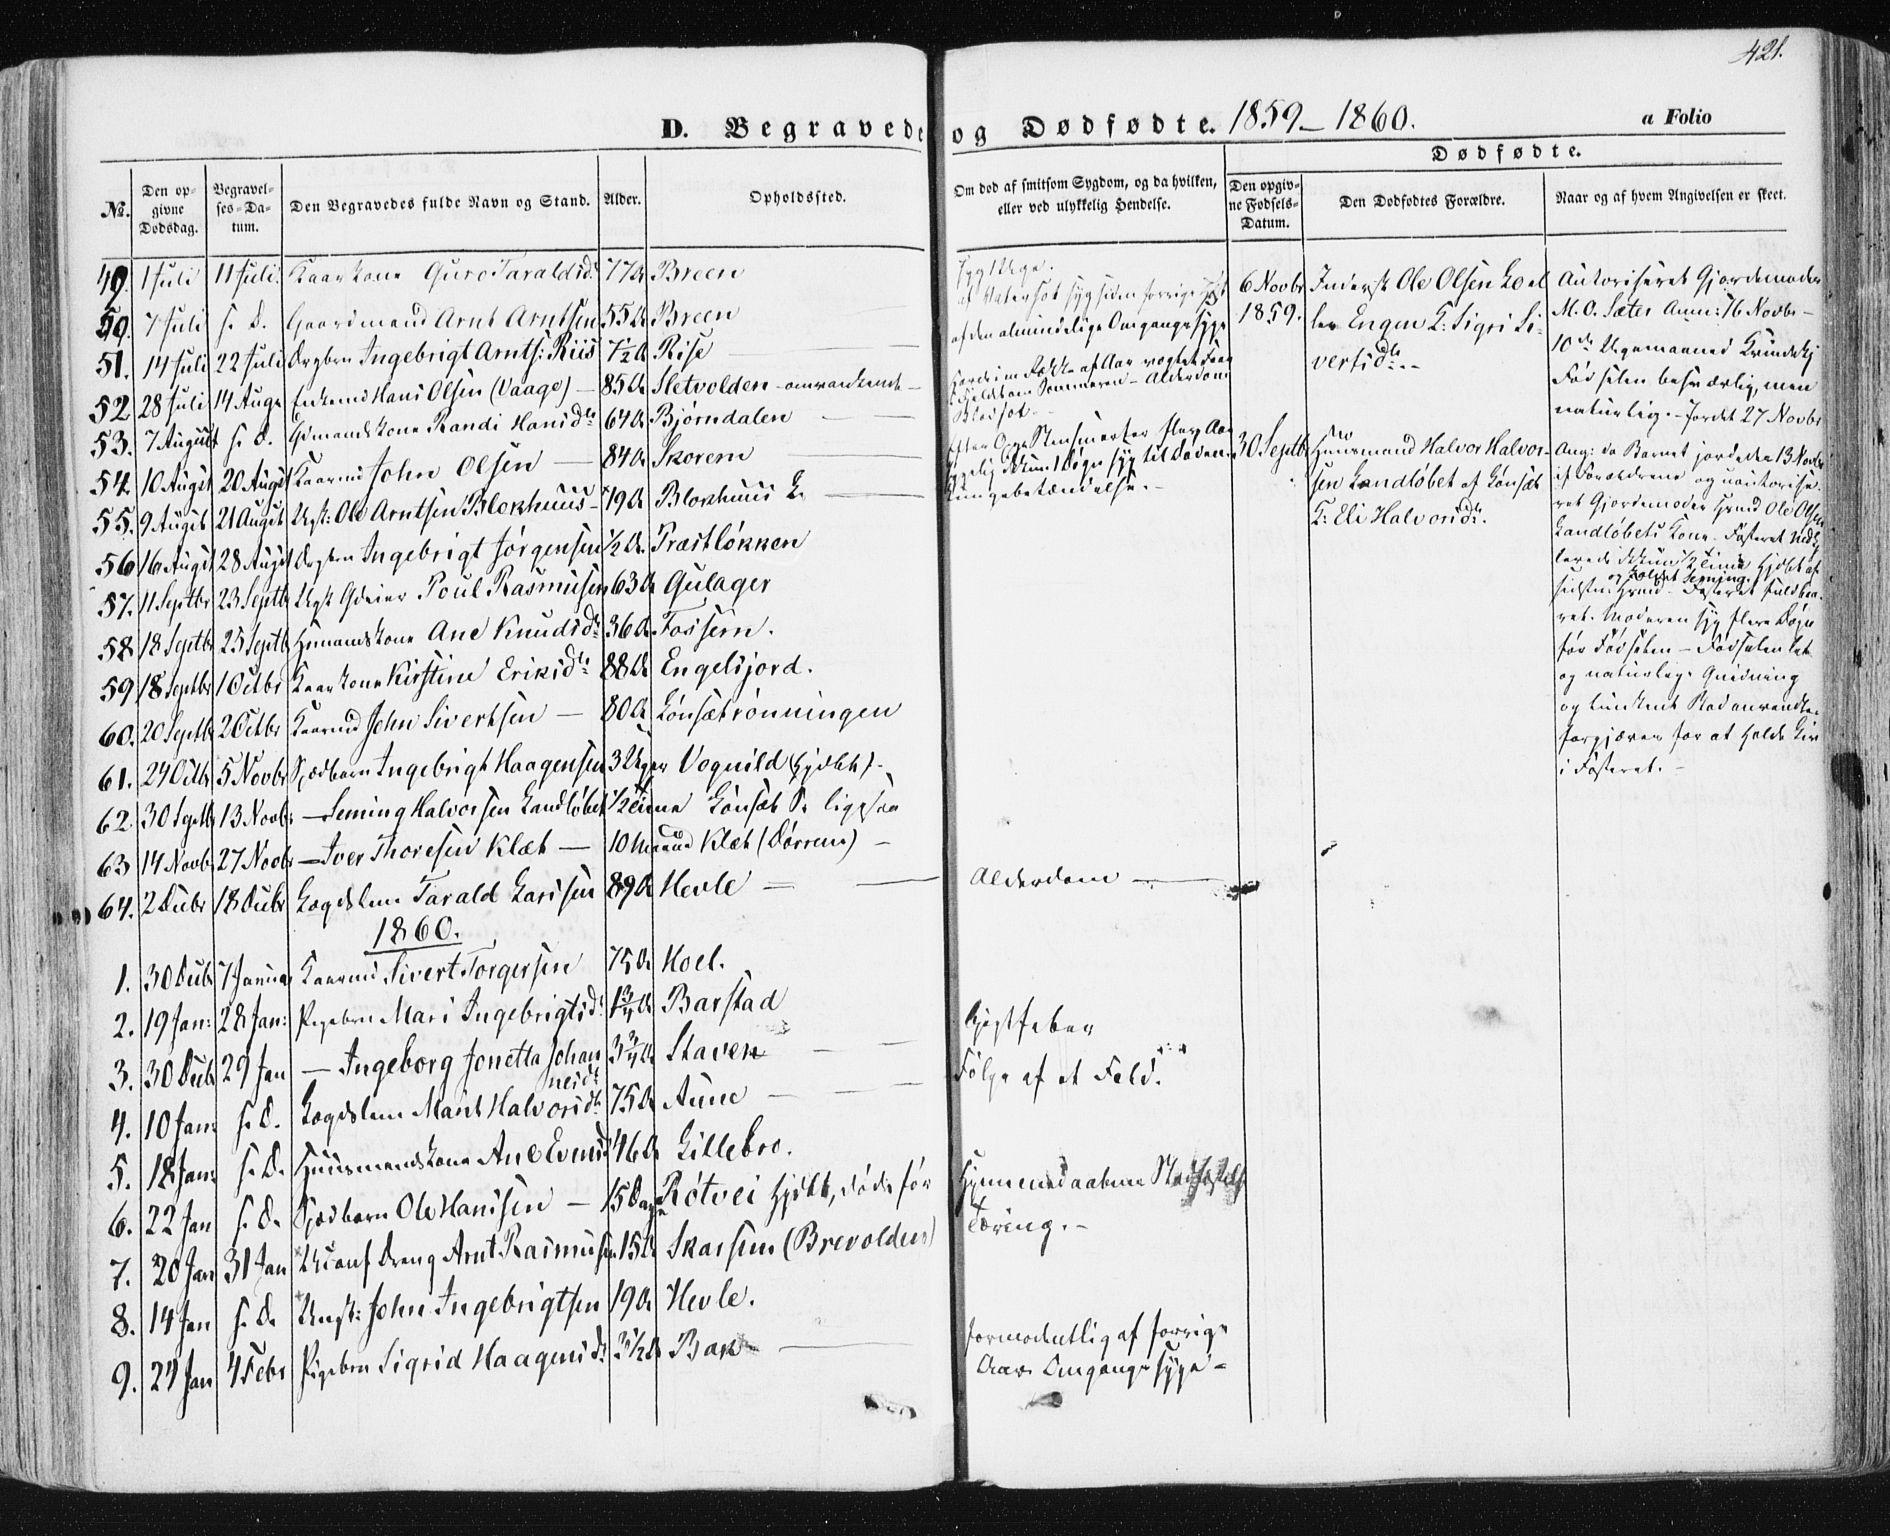 SAT, Ministerialprotokoller, klokkerbøker og fødselsregistre - Sør-Trøndelag, 678/L0899: Parish register (official) no. 678A08, 1848-1872, p. 421